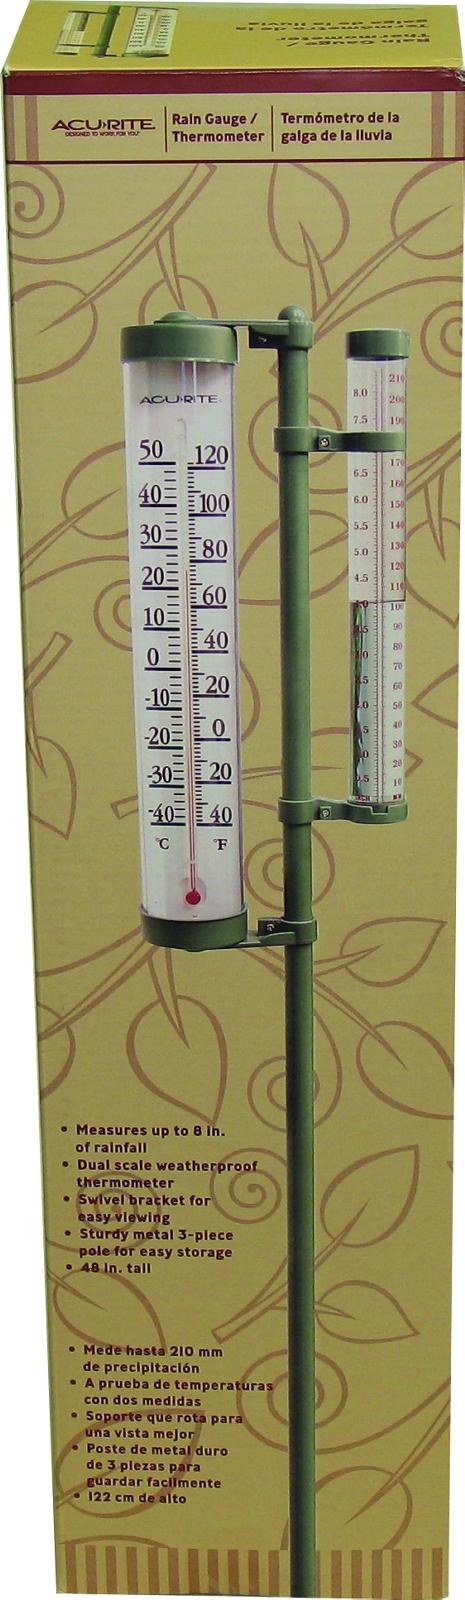 Thermometer Rain Gauge Combo